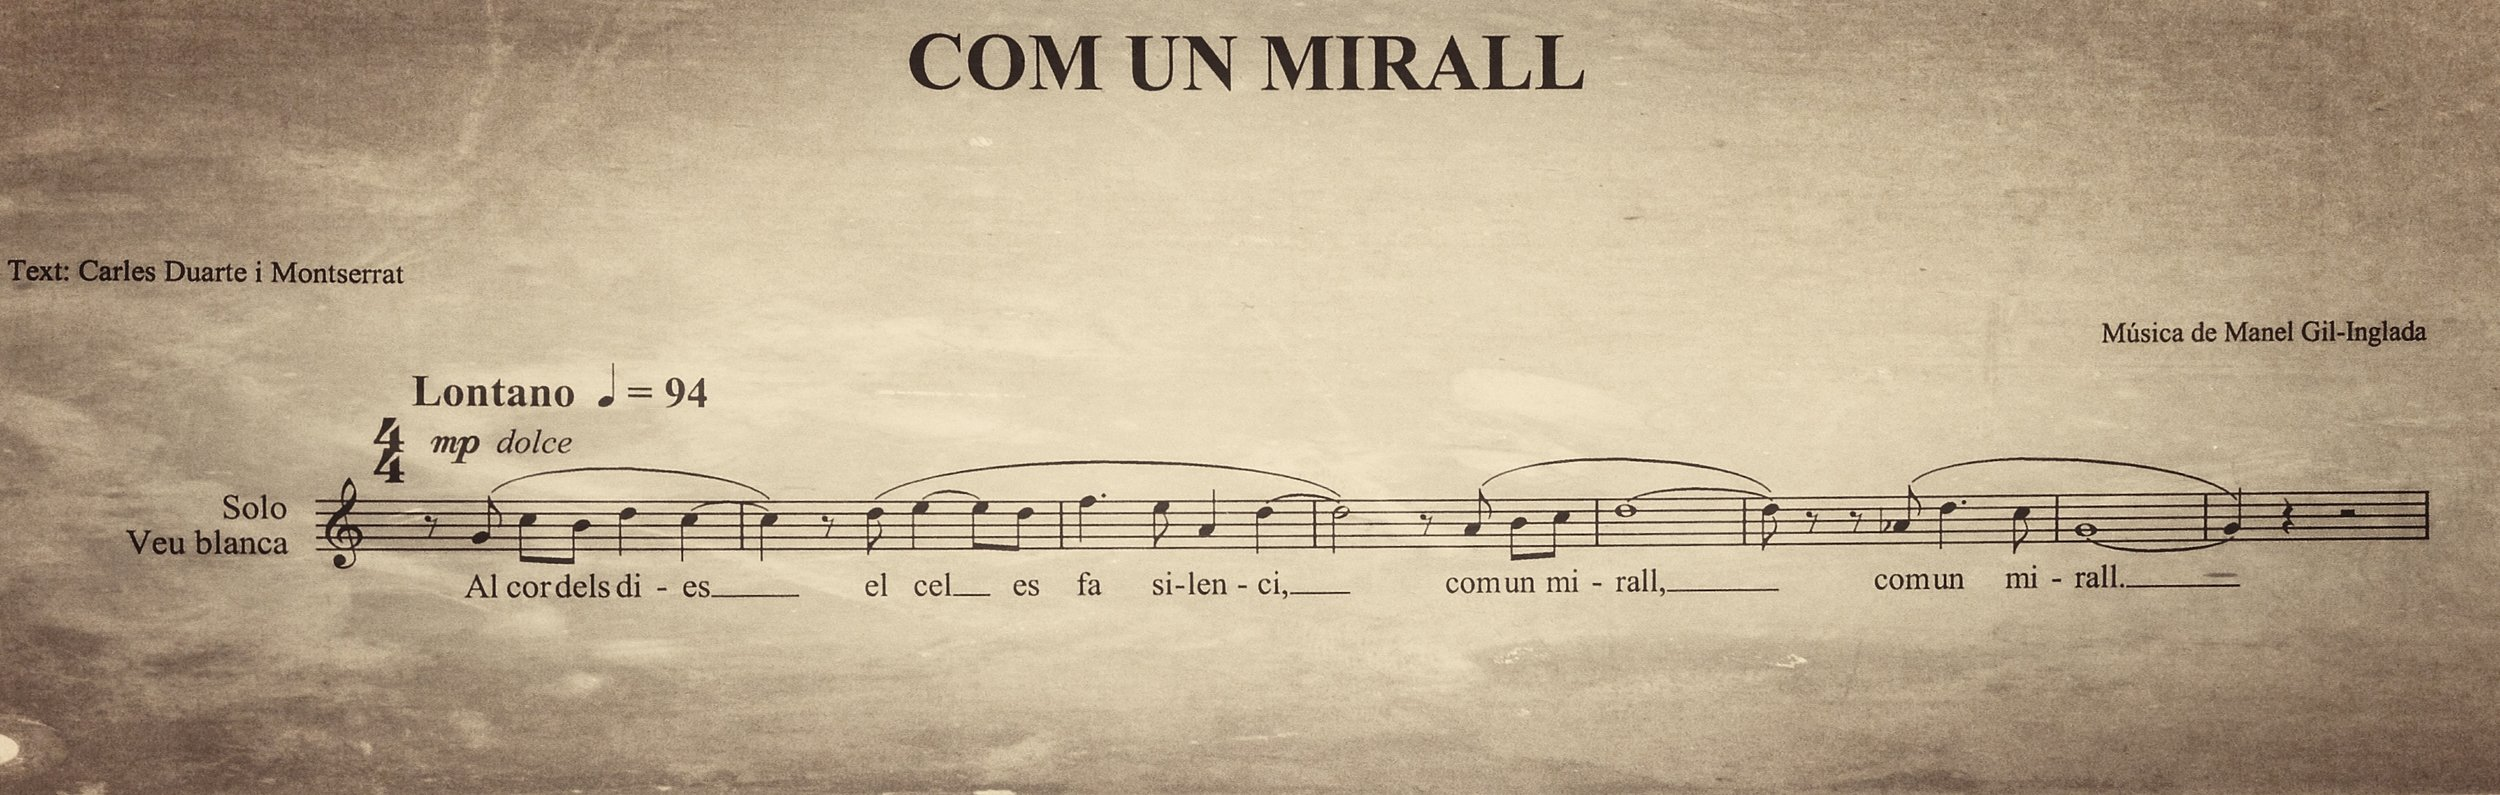 Com un mirall_Score